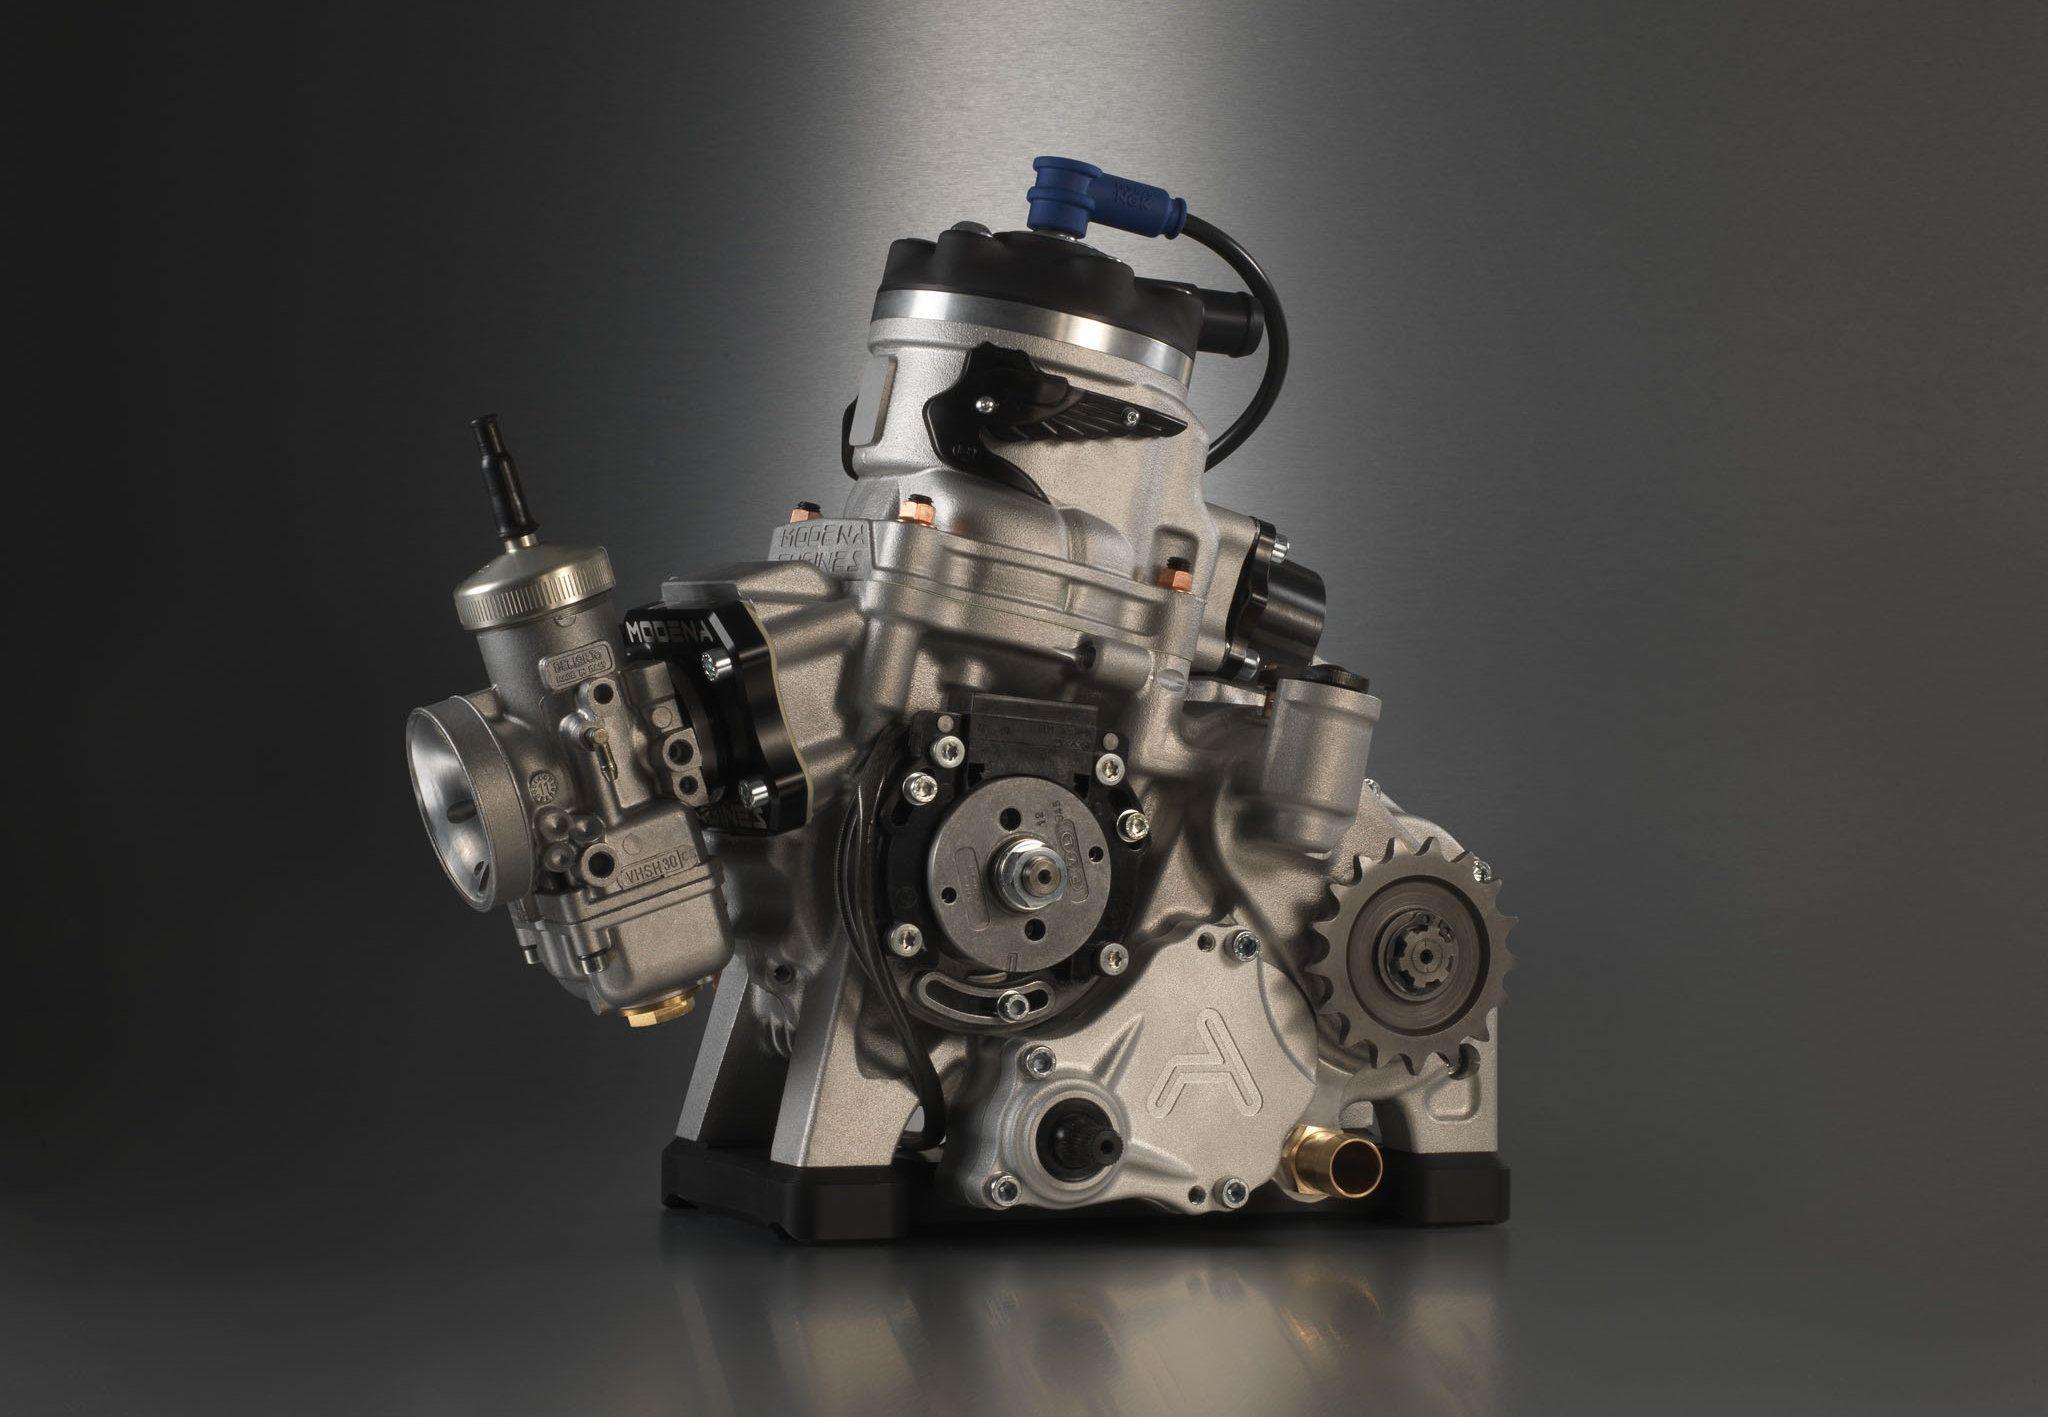 modena-kk1-engine-kart